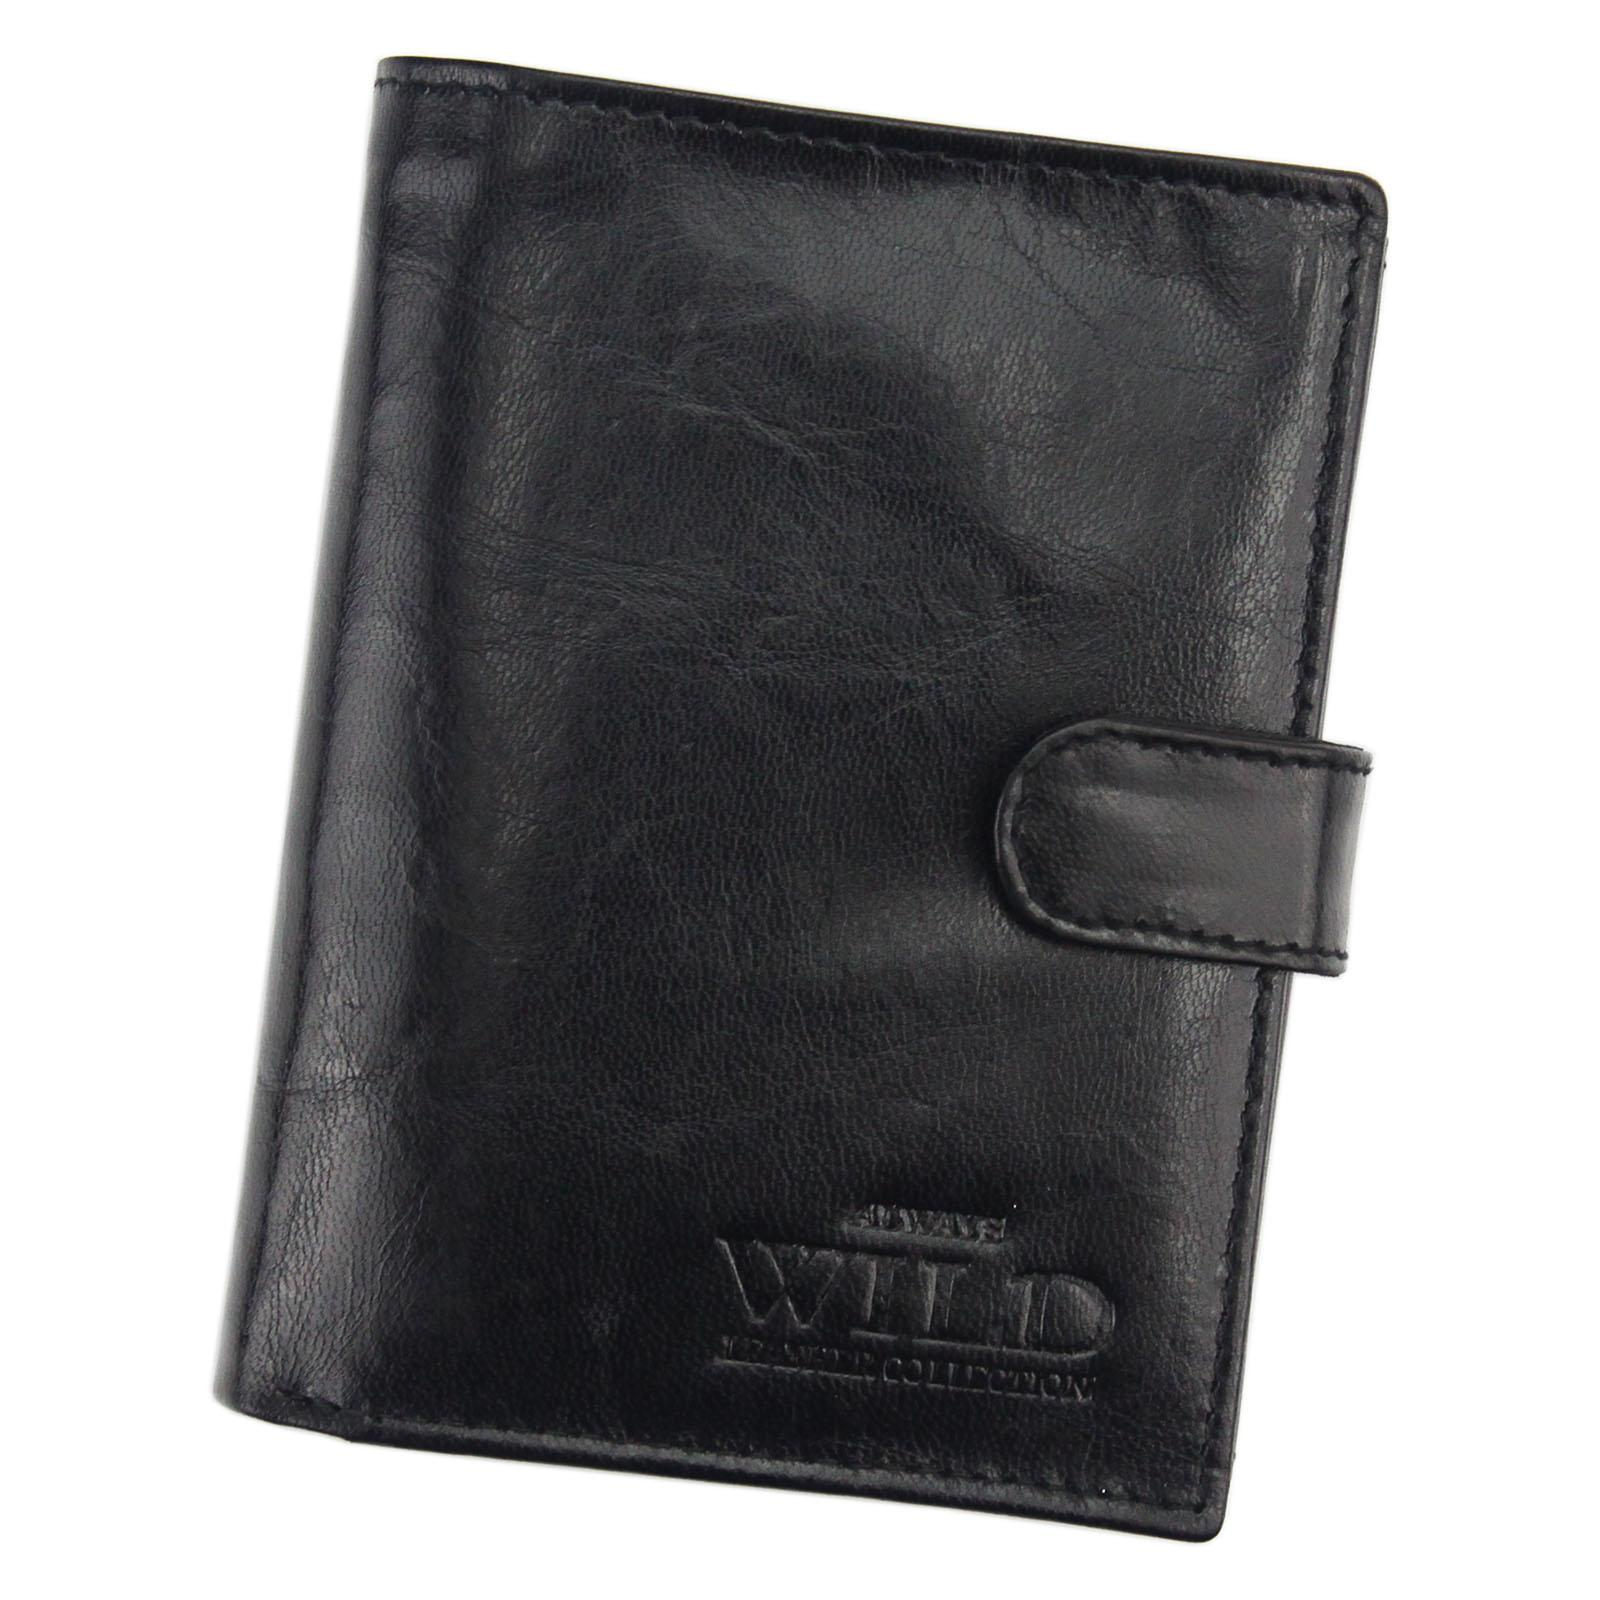 Pánska peňaženka Wild N4L-VTK